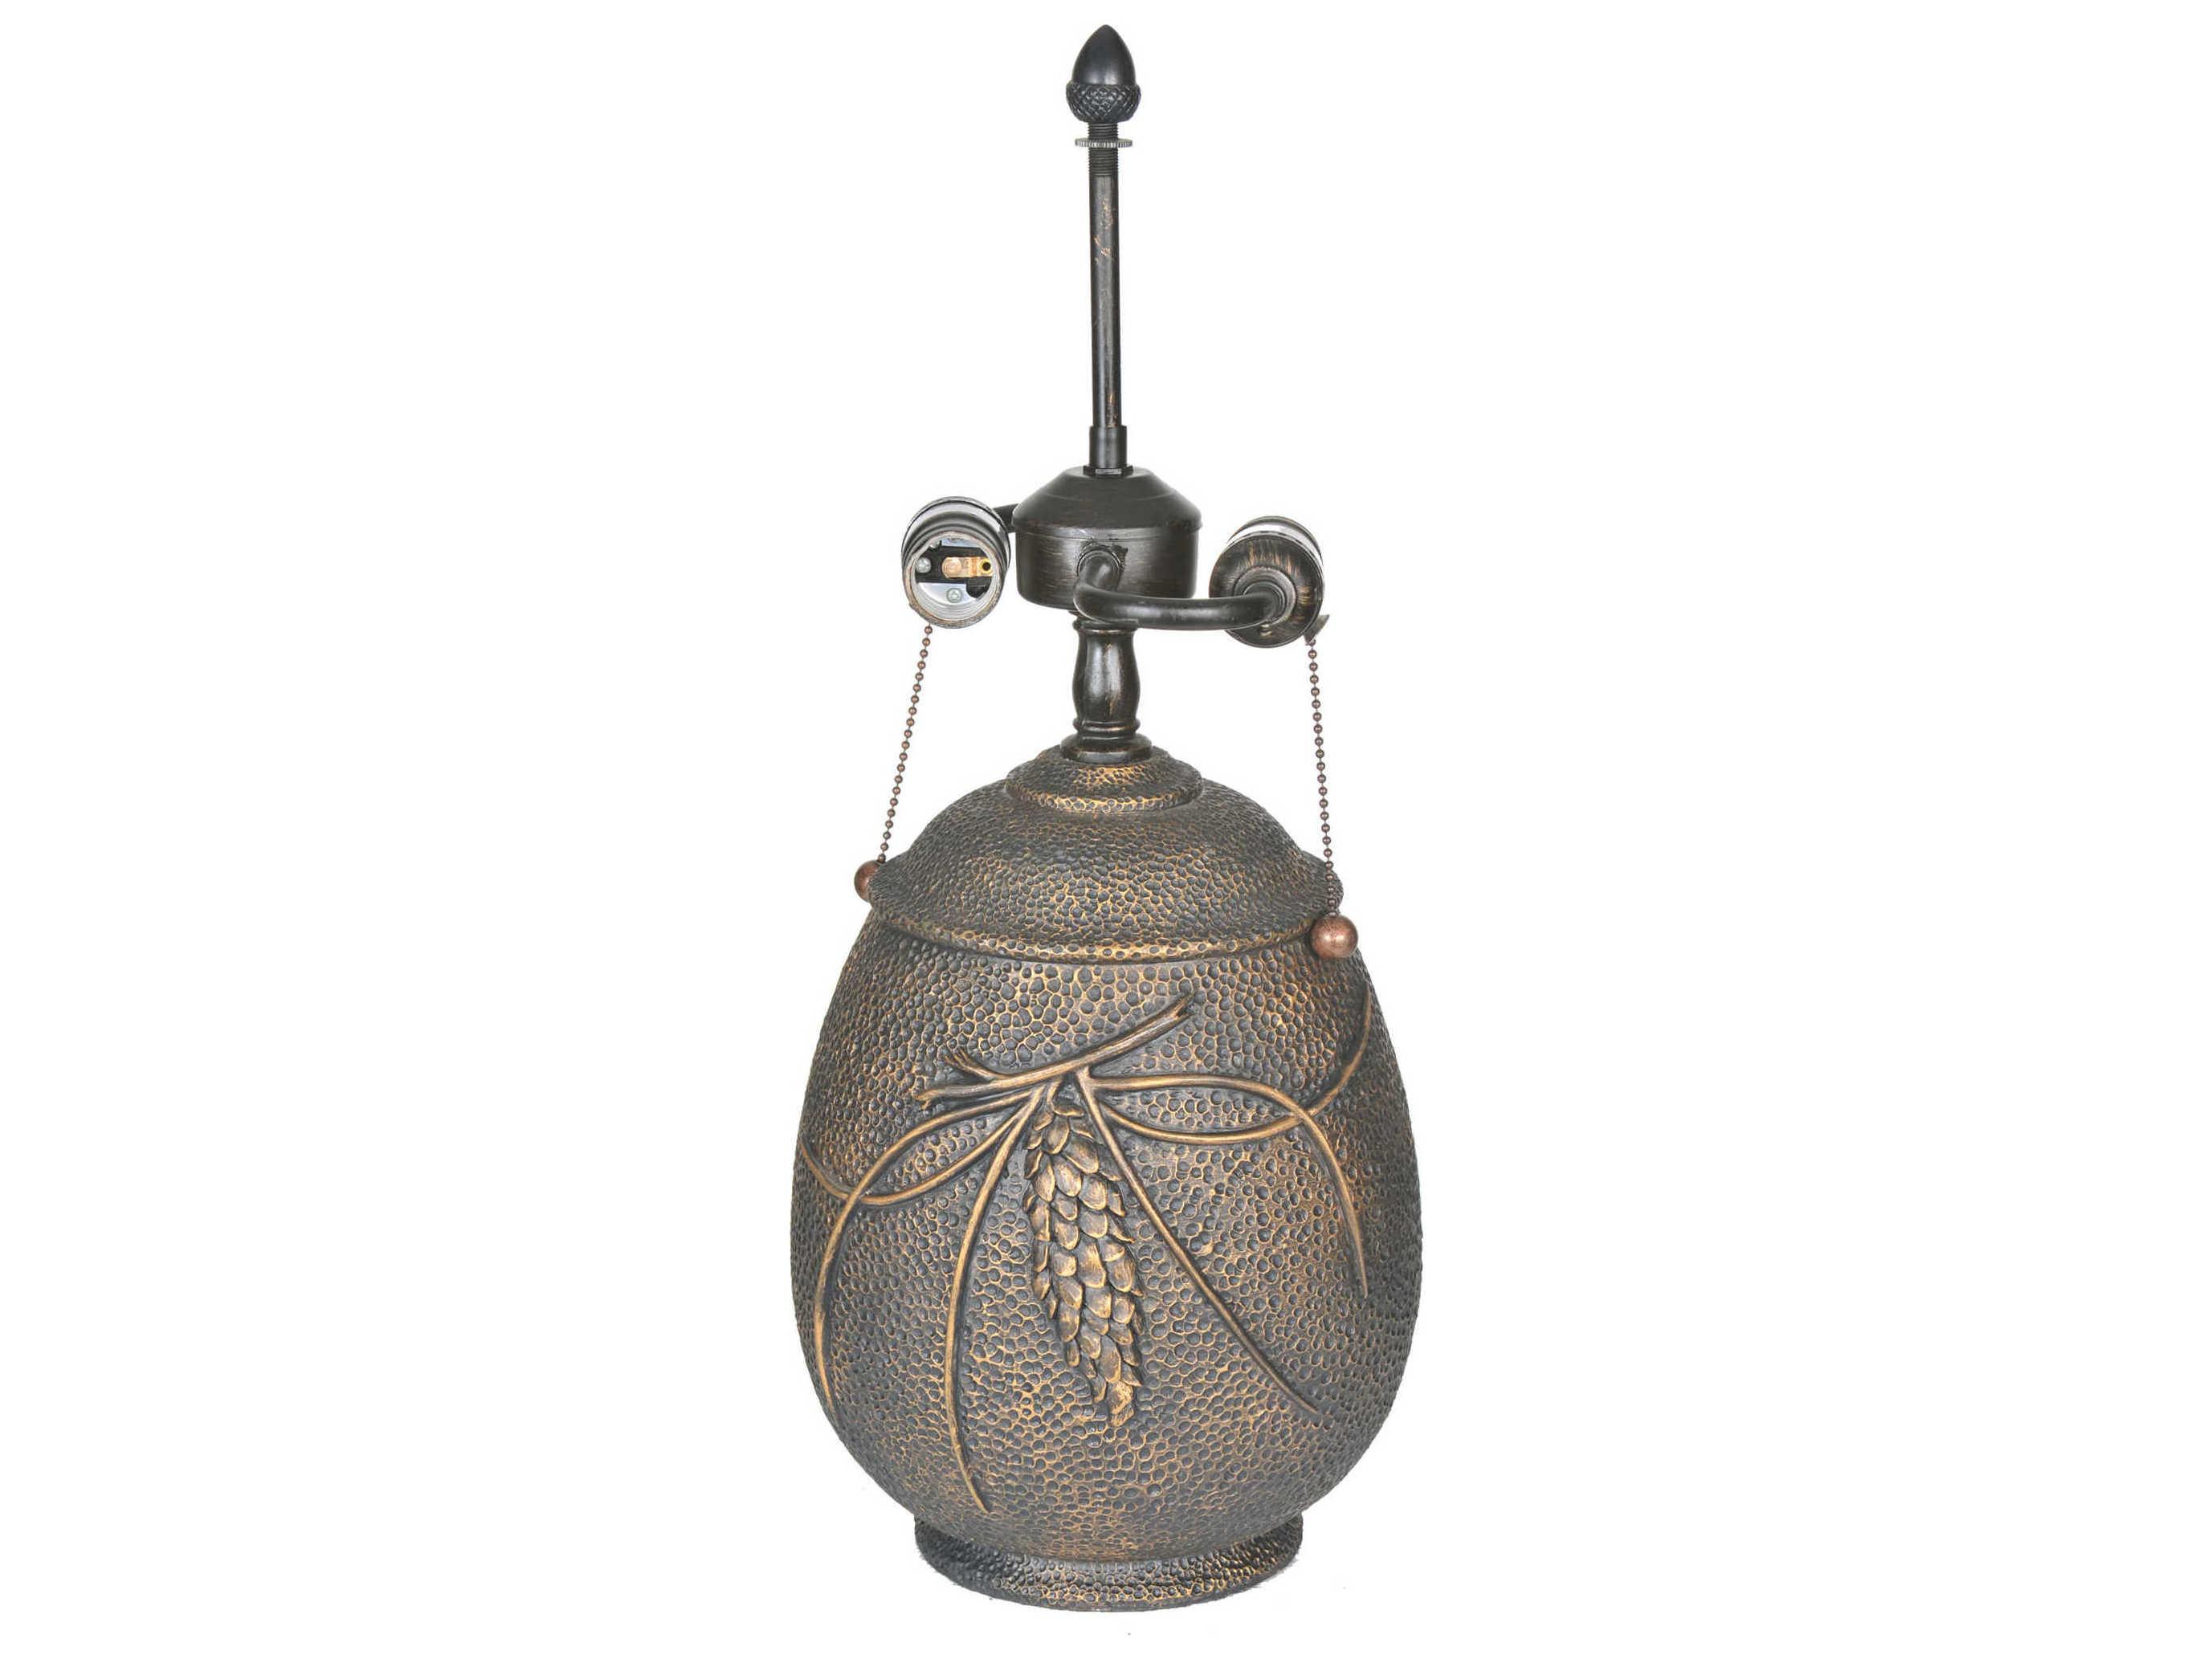 Meyda Tiffany Hammered Pinecone Table Lamp Base My72546